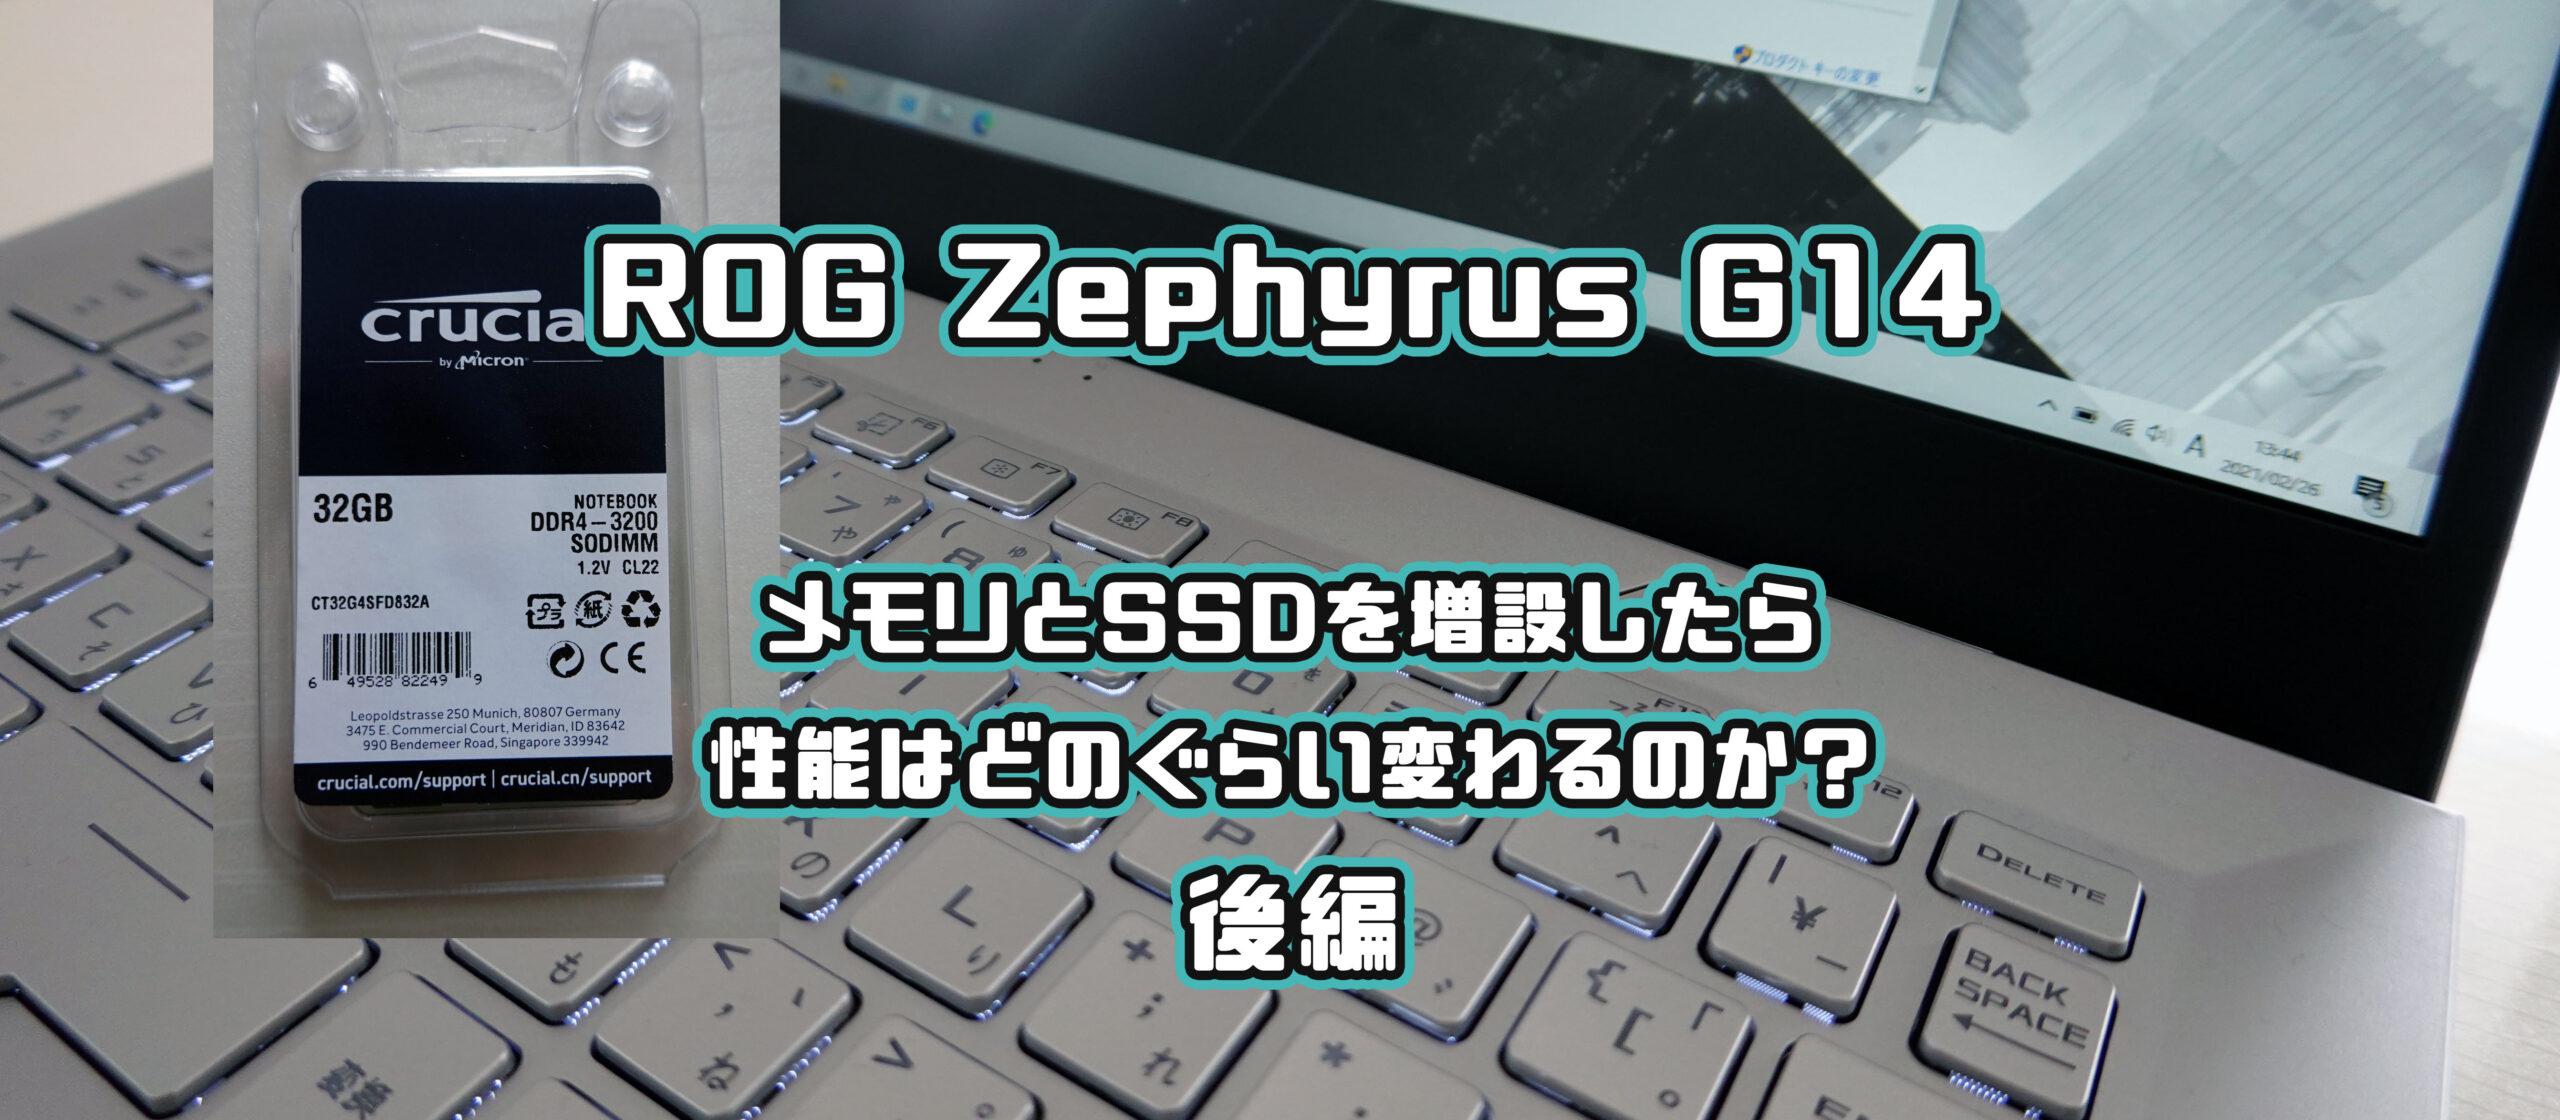 Zephyrus G14 メモリ増設 SSD交換 方法 効果